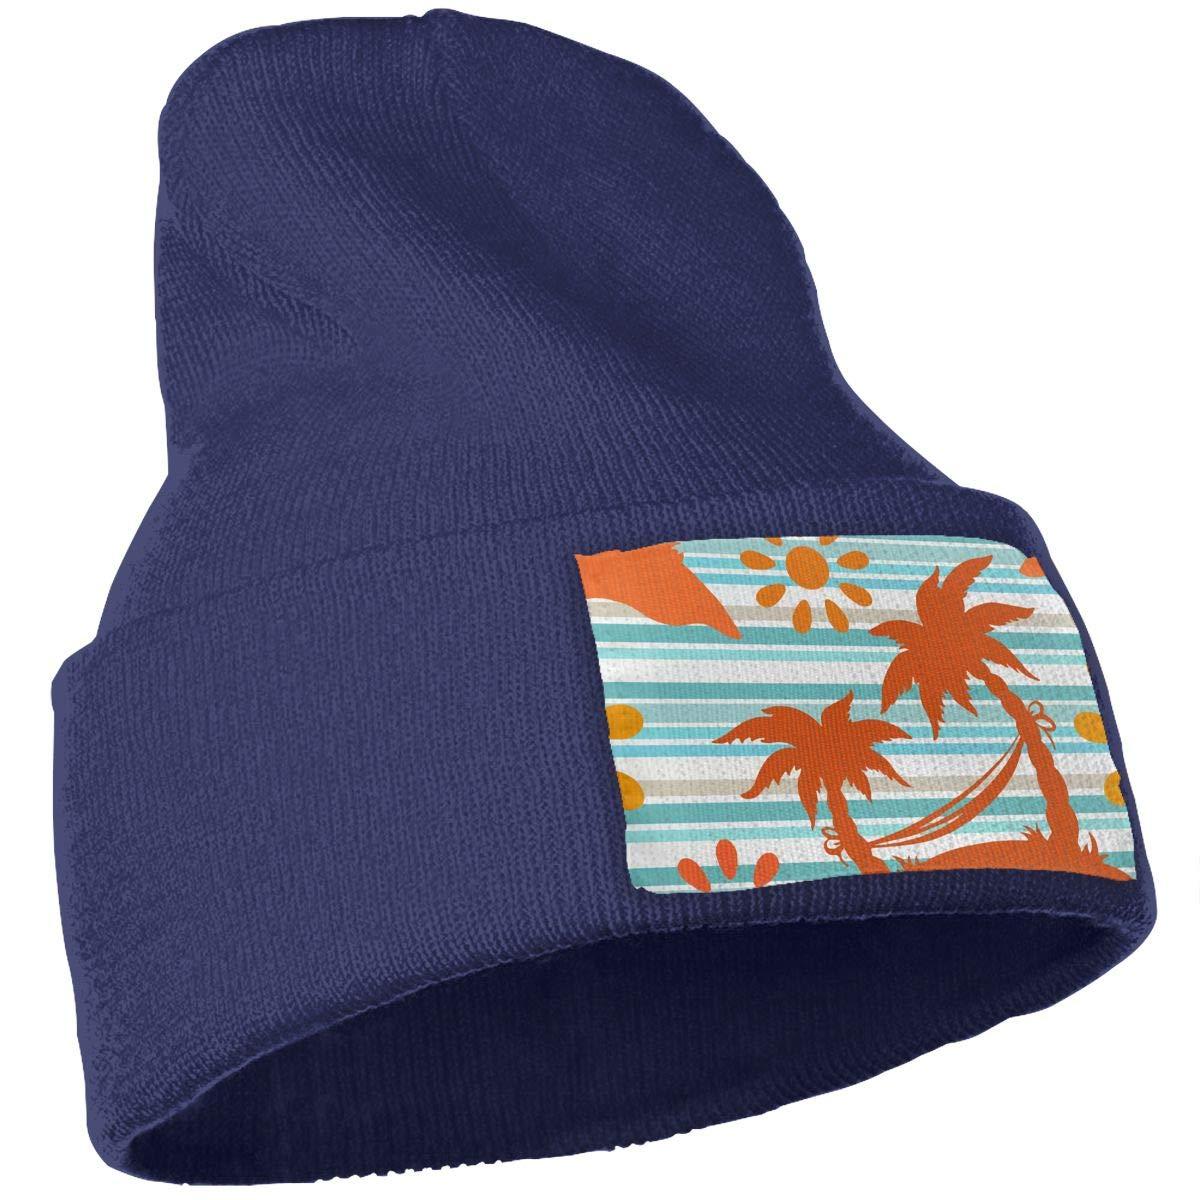 Palm Trees Hammock Men /& Women Skull Caps Winter Warm Stretchy Knitting Beanie Hats Sun